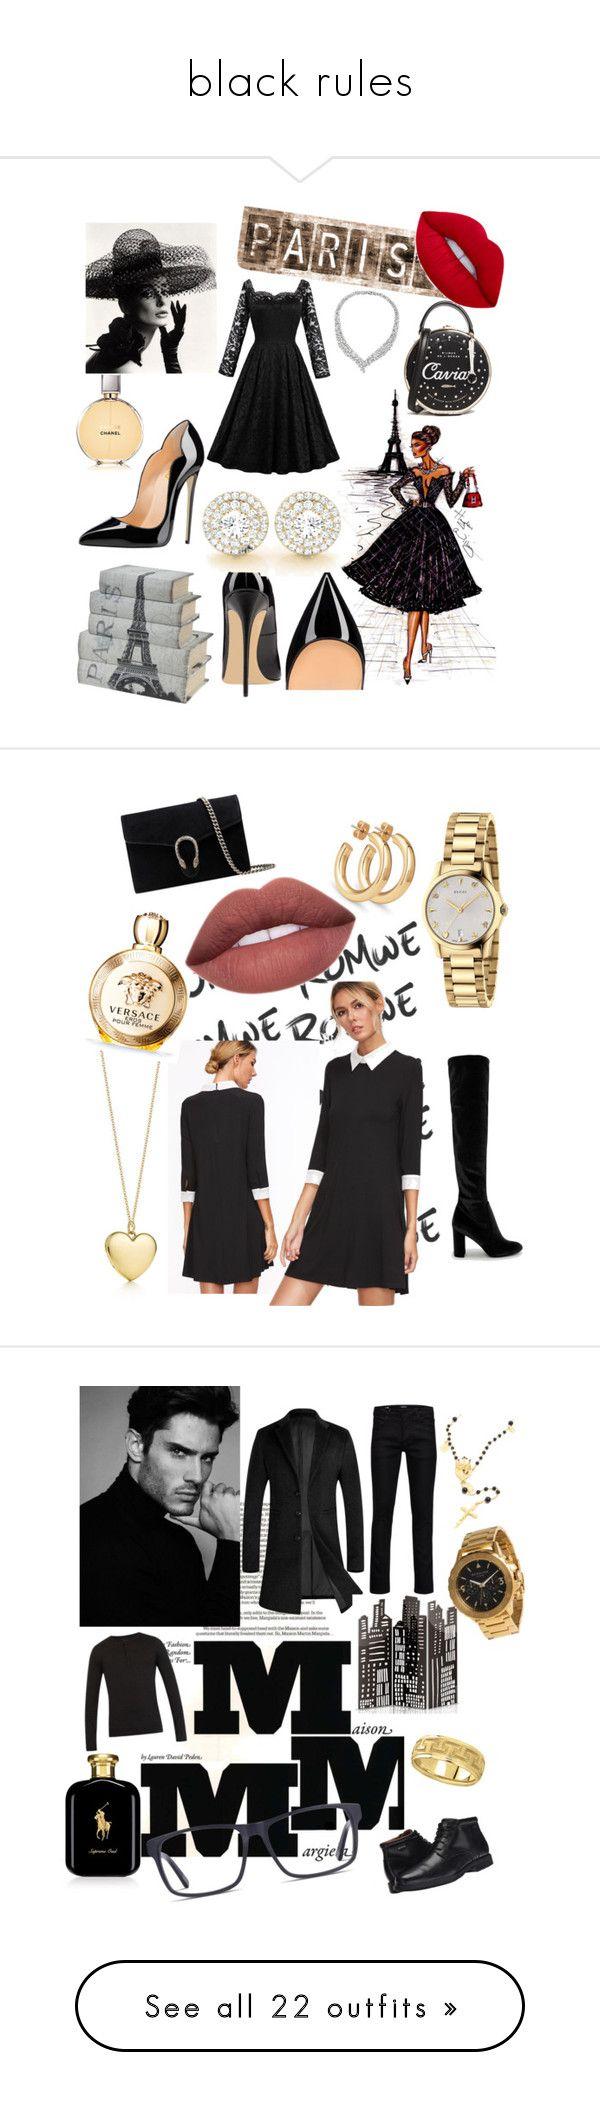 """black rules"" by fashionstar333 ❤ liked on Polyvore featuring Leftbank Art, Kate Spade, Chanel, parisfashionweek, Packandgo, CHARLES & KEITH, Gucci, Versace, Maison Margiela and Falke"